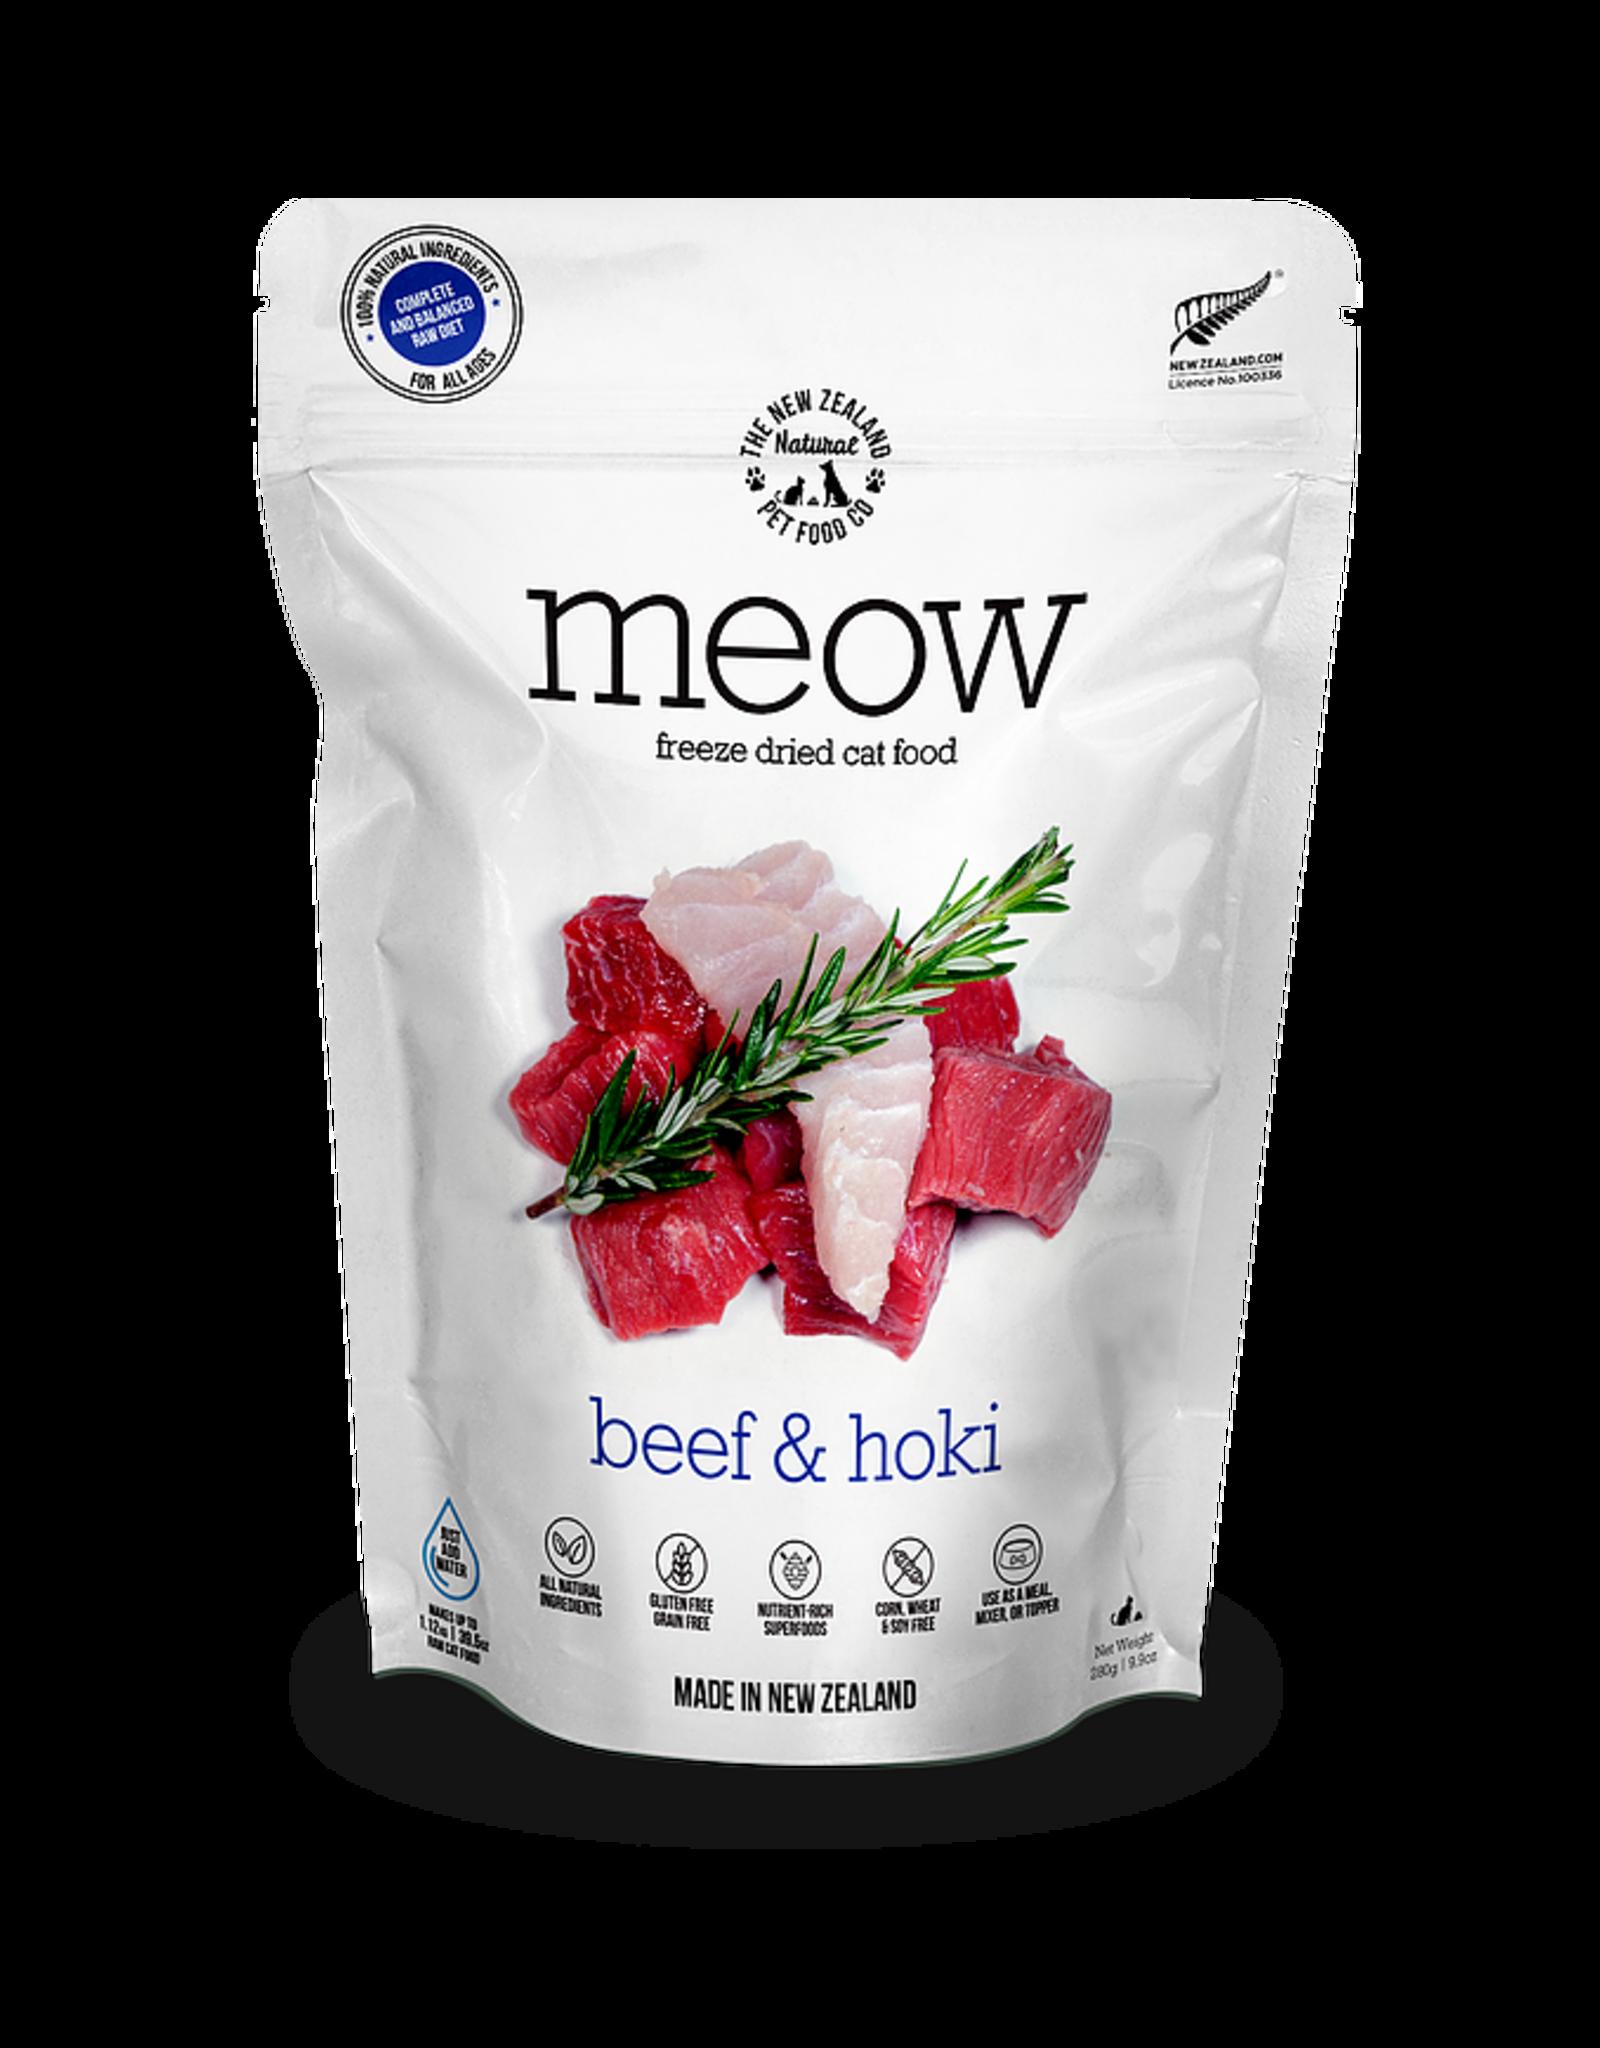 New Zealand Pet Food Co. NewZealand PetFoodCo - MEOW Beef & Hoki 280g